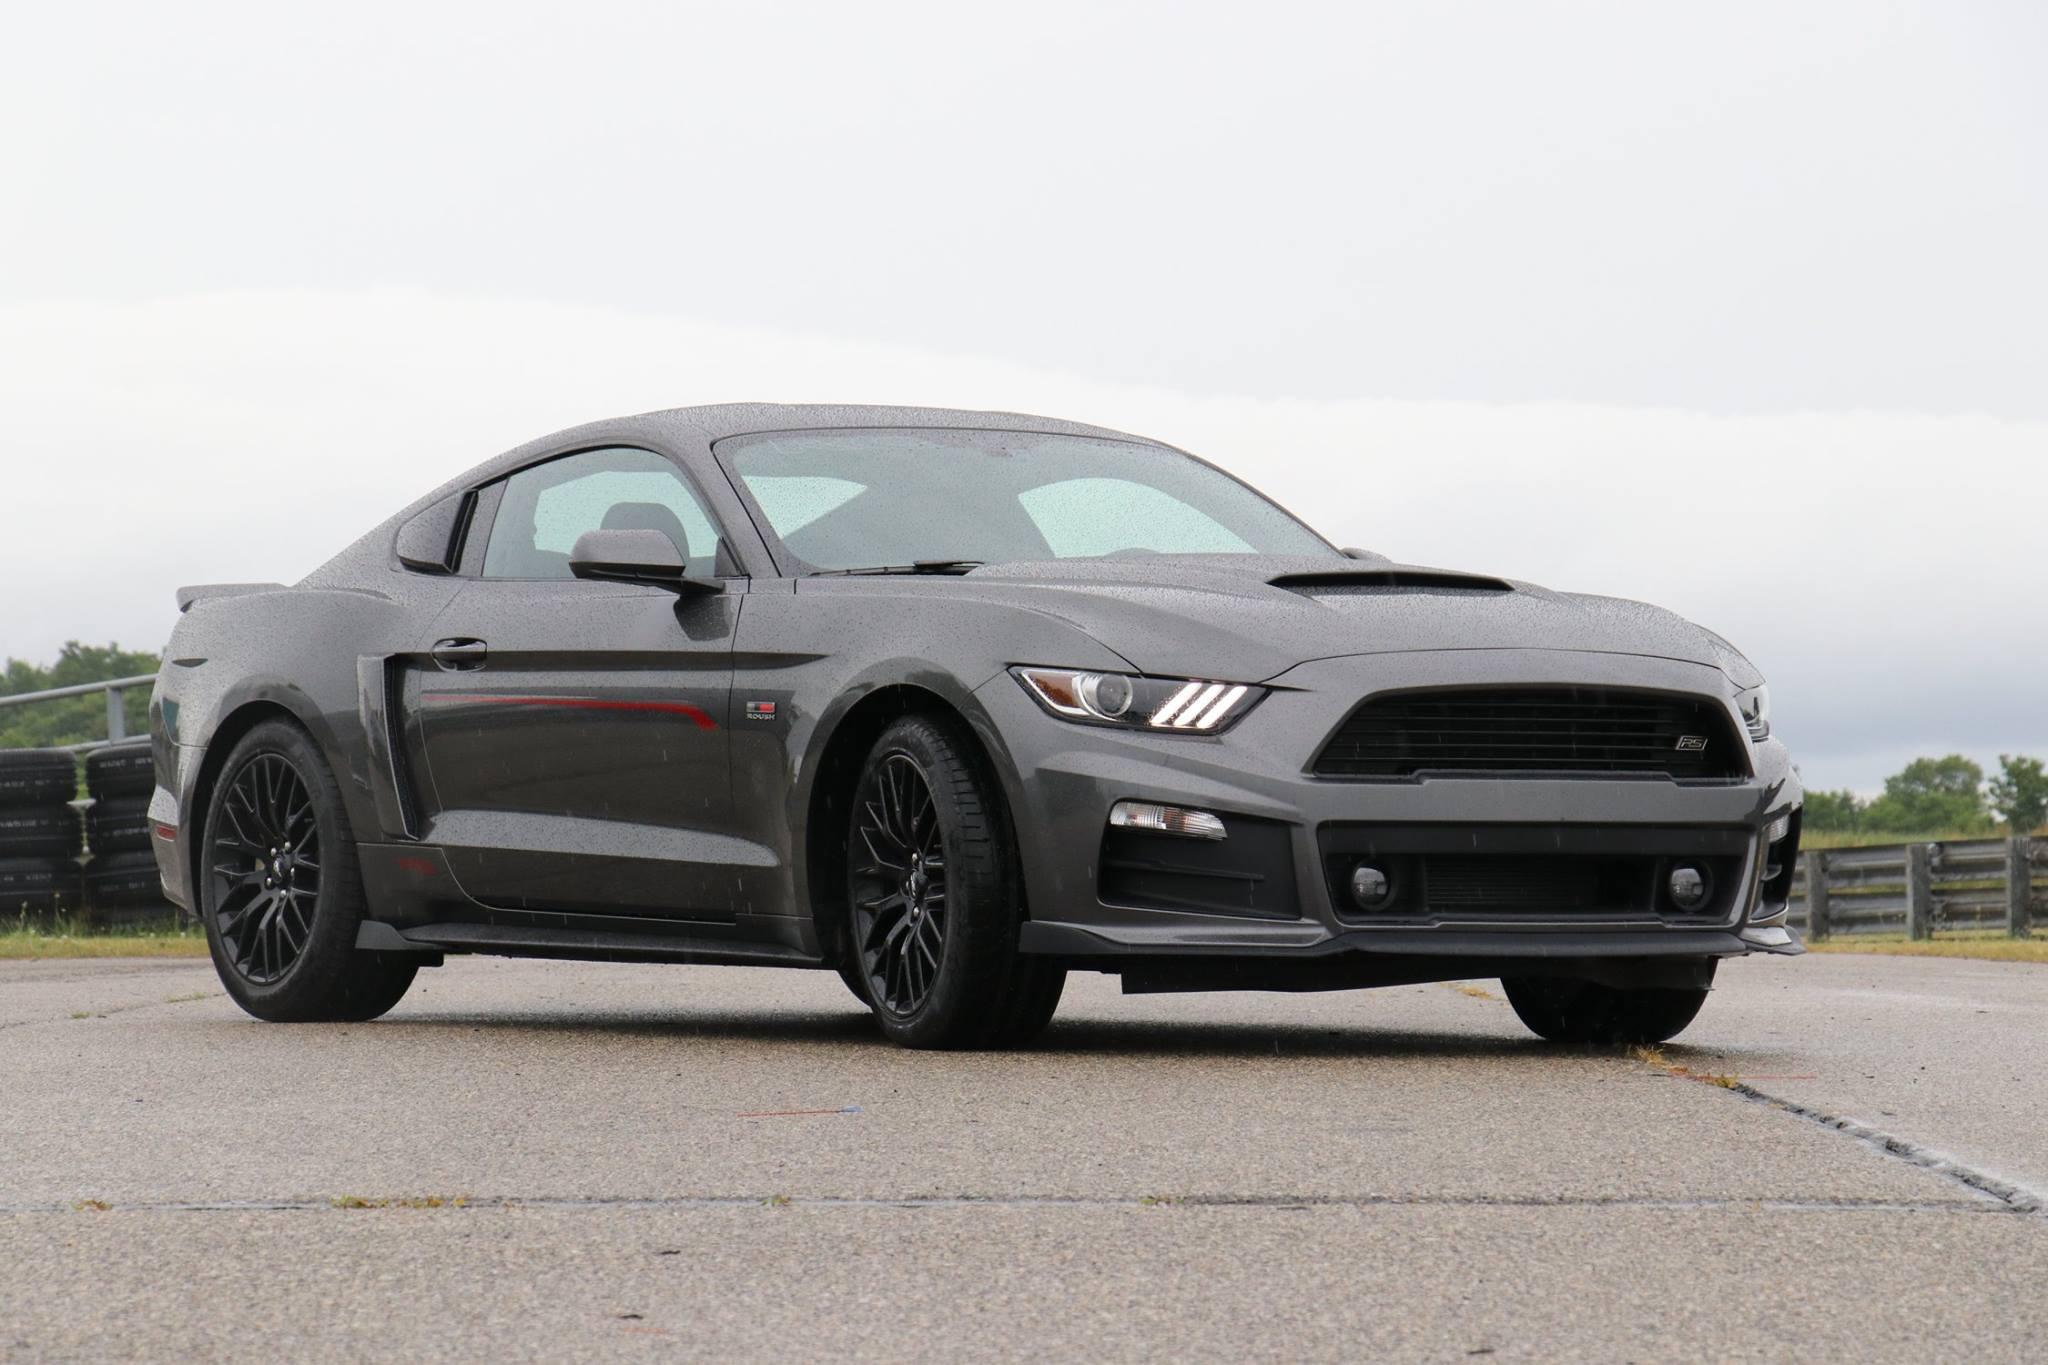 ROUSH RS Mustang – Entry Level Performance for Under $30K